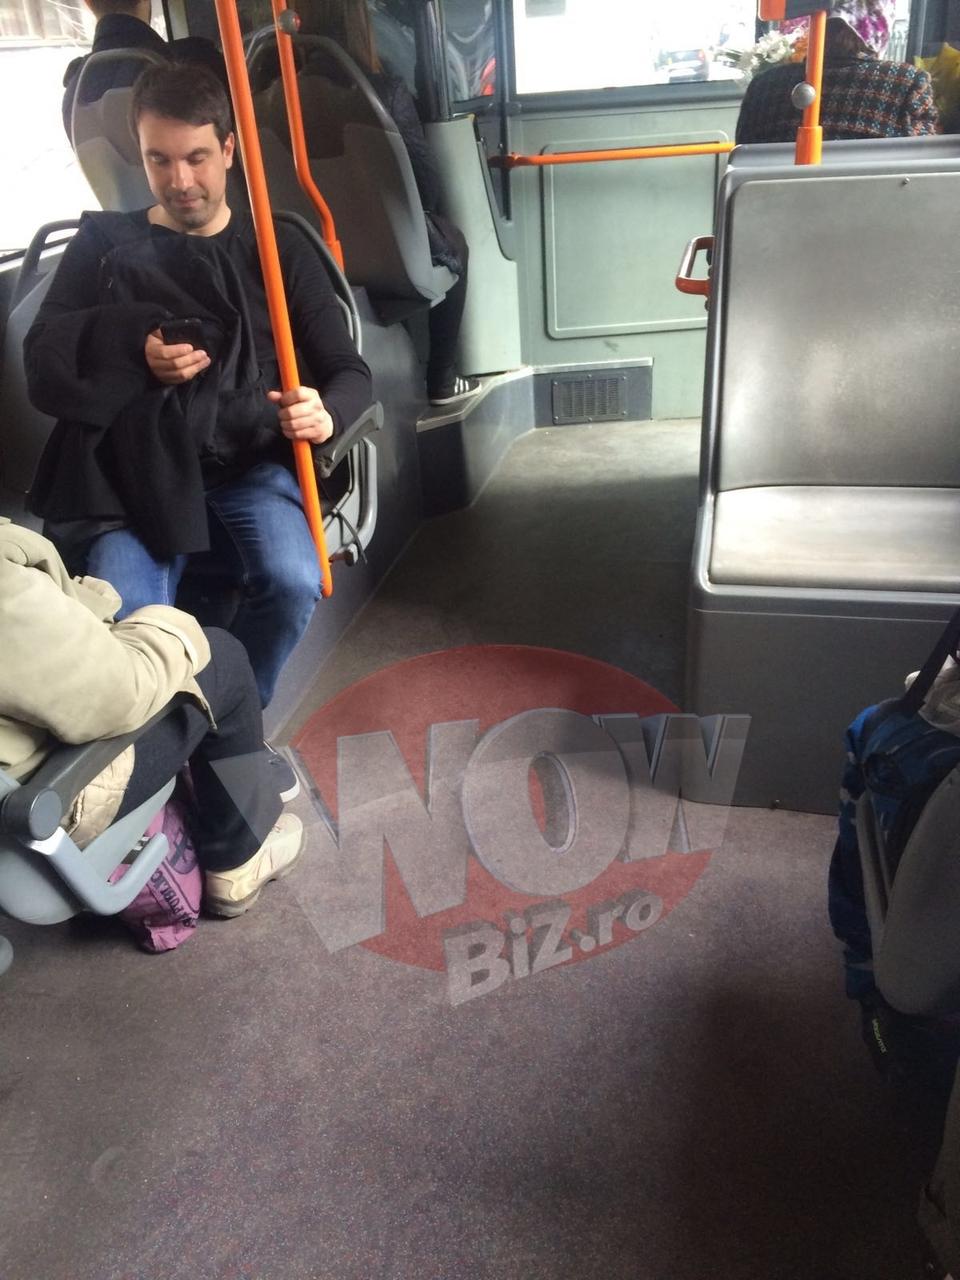 "FOTO EXCLUSIV! Alexandru Papadopol se plimba cu autobuzul laolalta cu ""muritorii de rand""! Cunoscutul actor nu si-a luat aere de vedeta, cu toate ca-l stie o tara intreaga!"